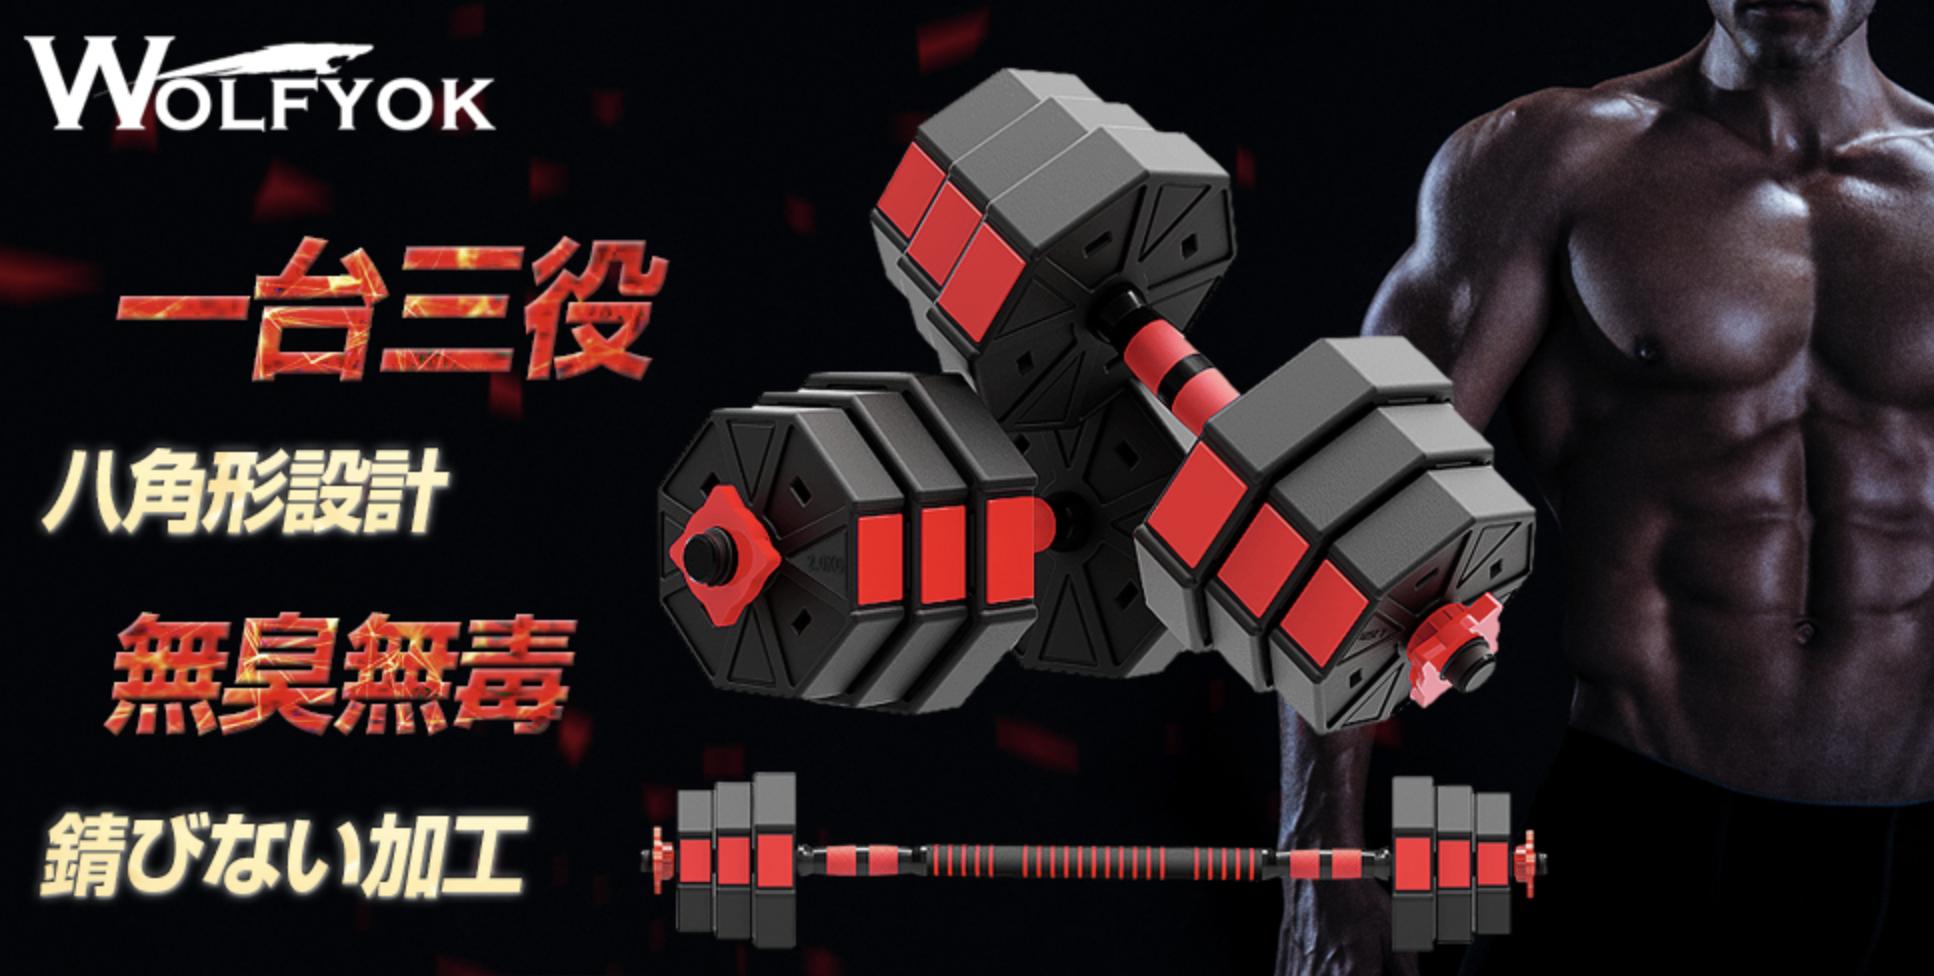 「Wolfyok」バーベルに変更可能 20kgセット(10kgx2)